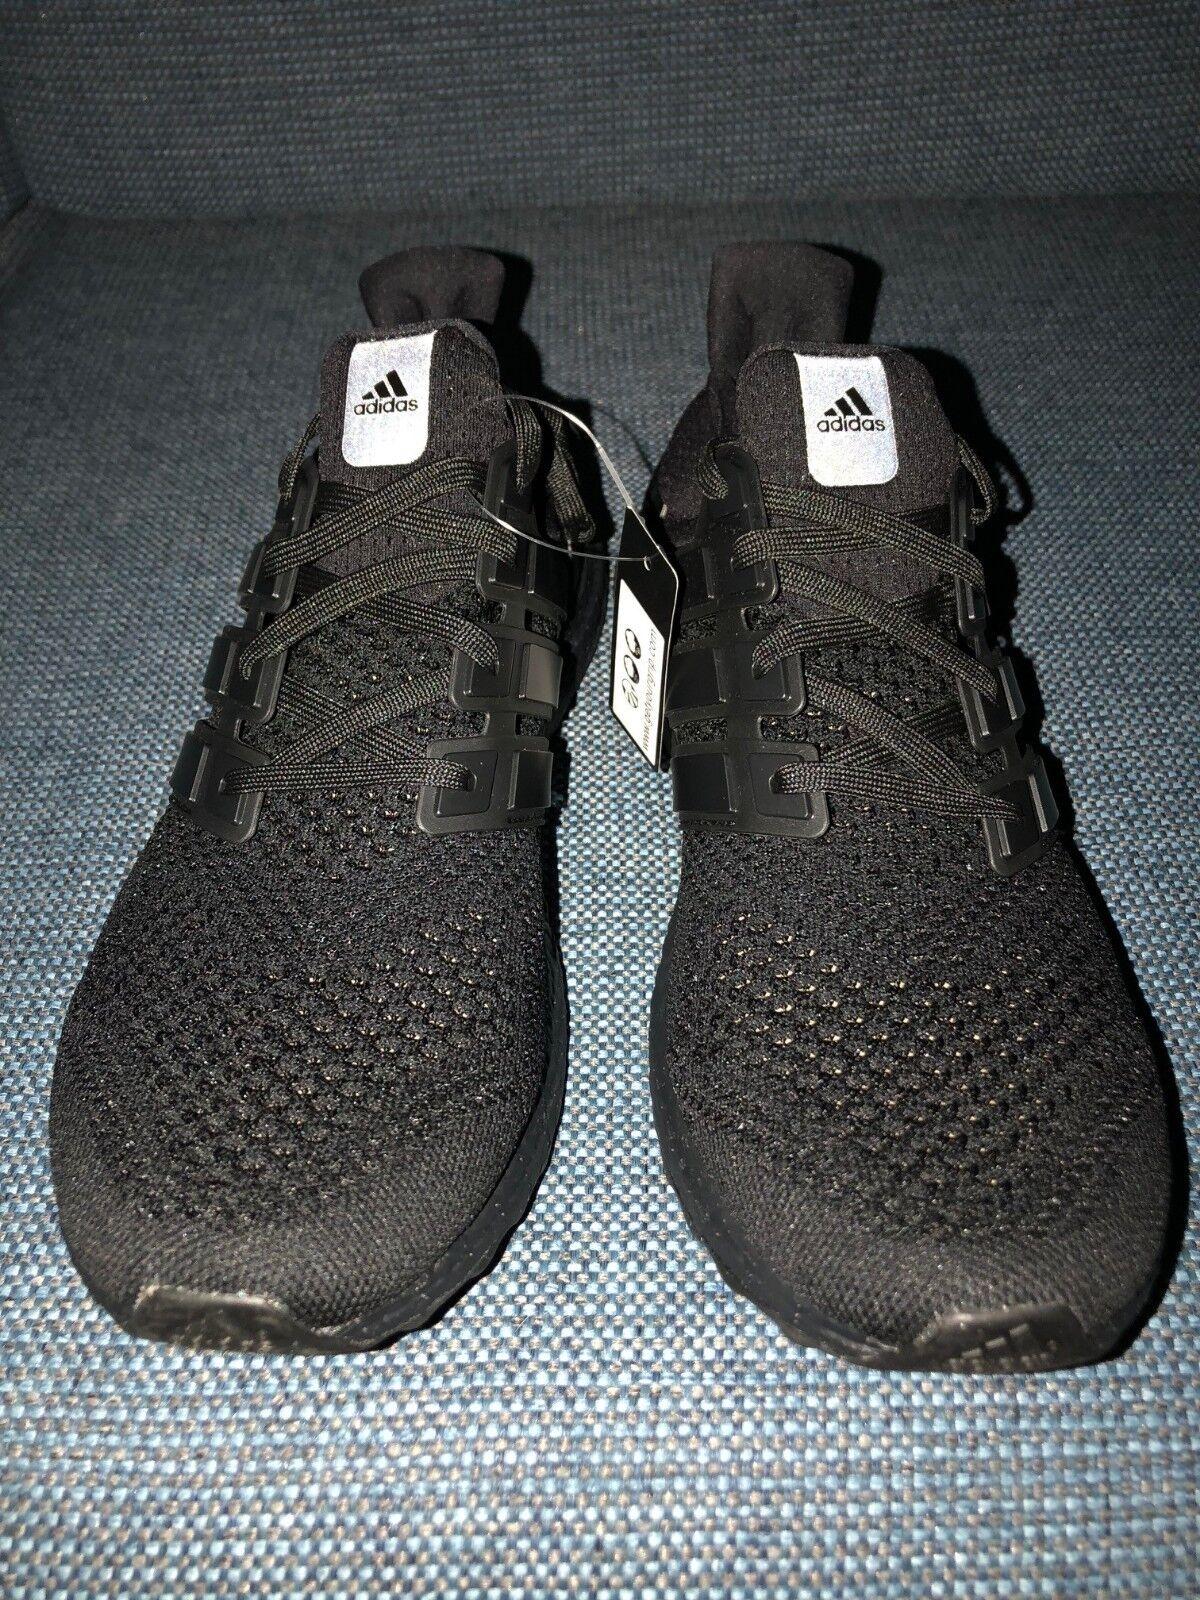 1ff58affa46f4 ... usa adidas ultra boost ltd 10 comodo triple negro style bb4677 comodo  10 bc1a53 9c147 3b644